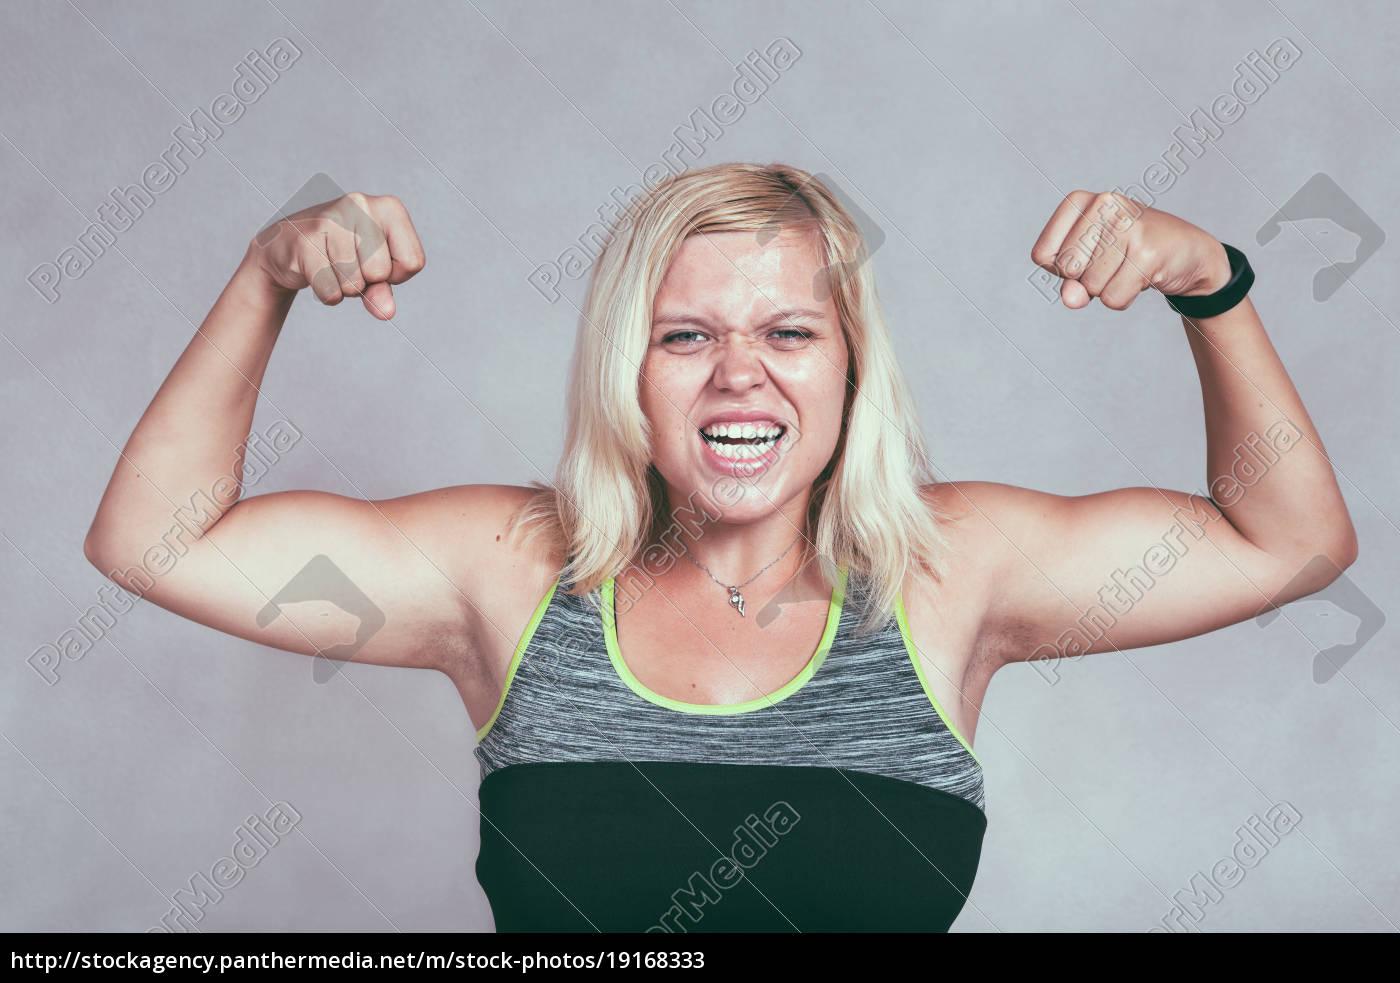 Muskulös frau Frau